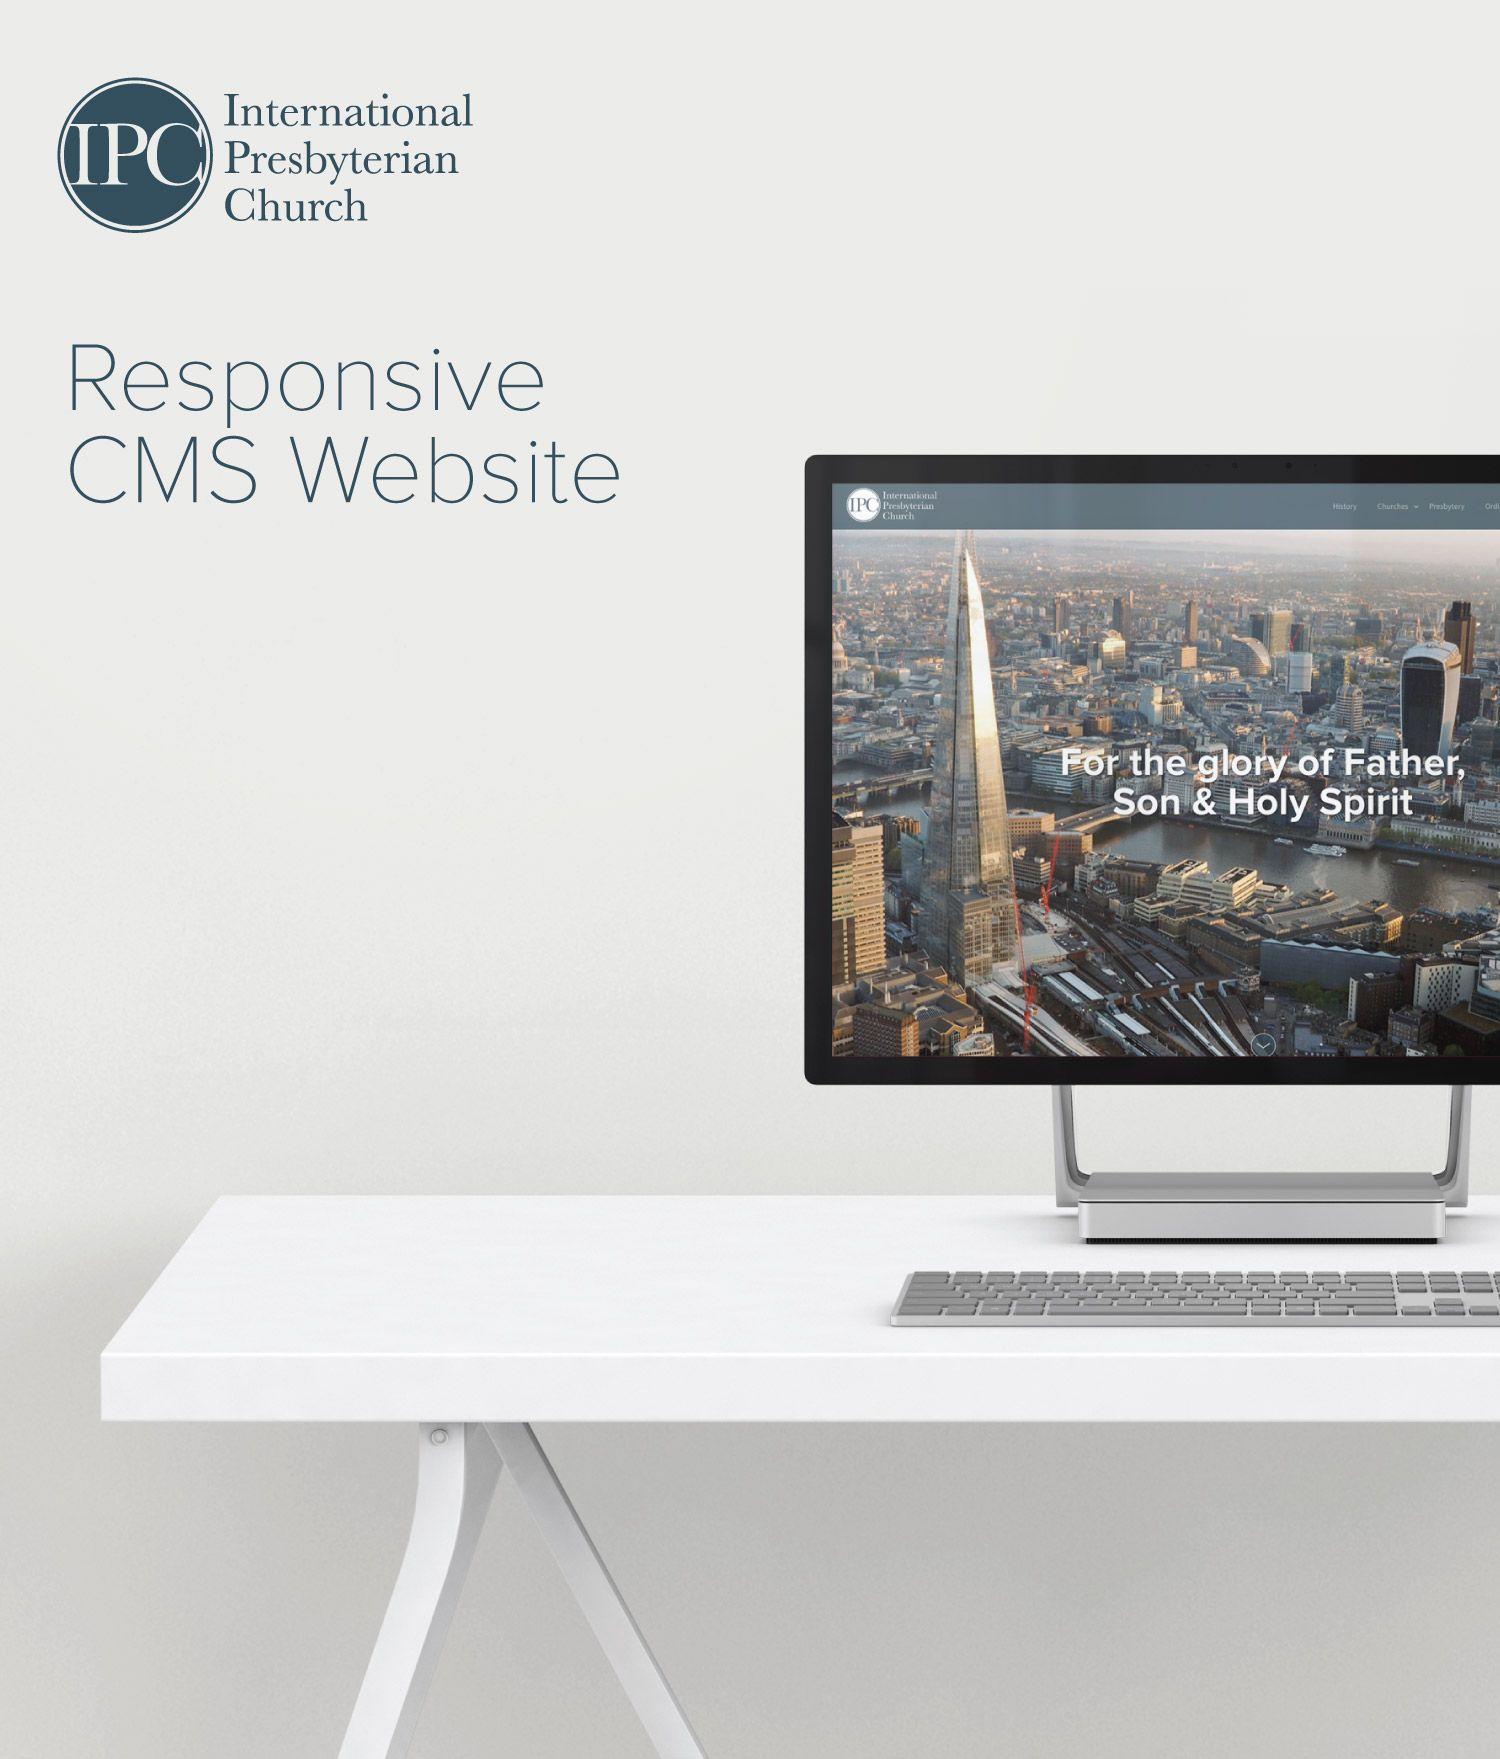 Web Design for International Presbyterian Church, Worldwide